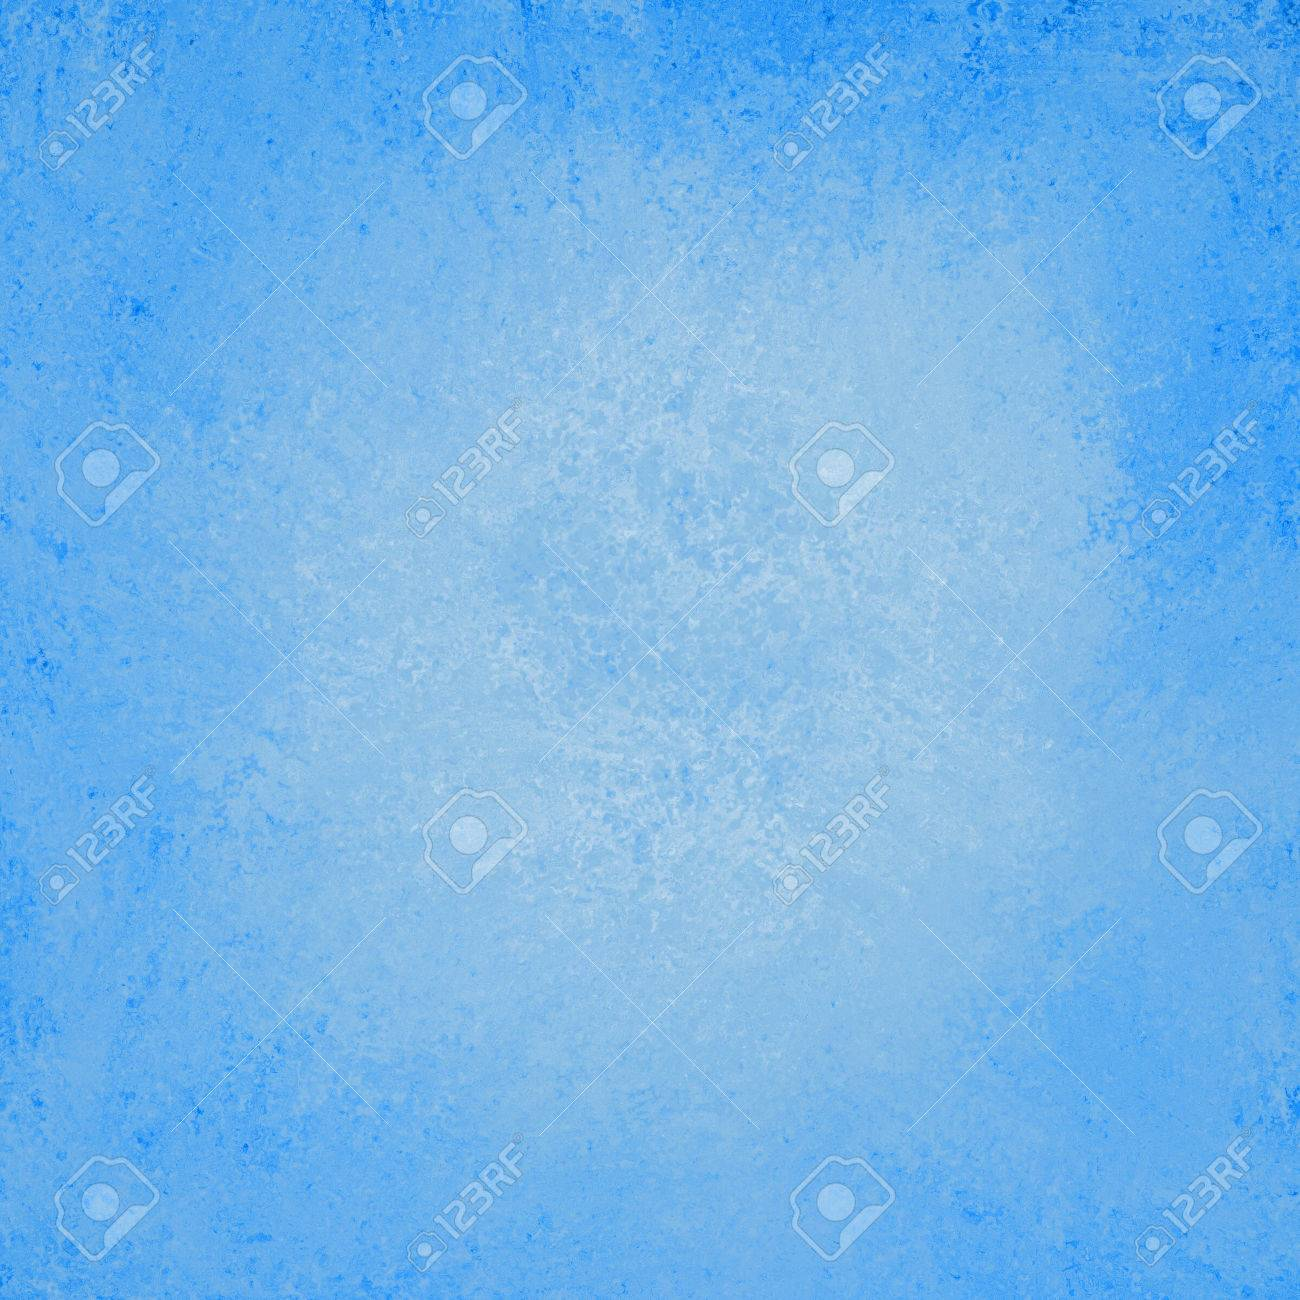 stock photo pale sky blue background soft pastel vintage background grunge texture light solid design white background cool plain wall paper - Light Sky Blue Color